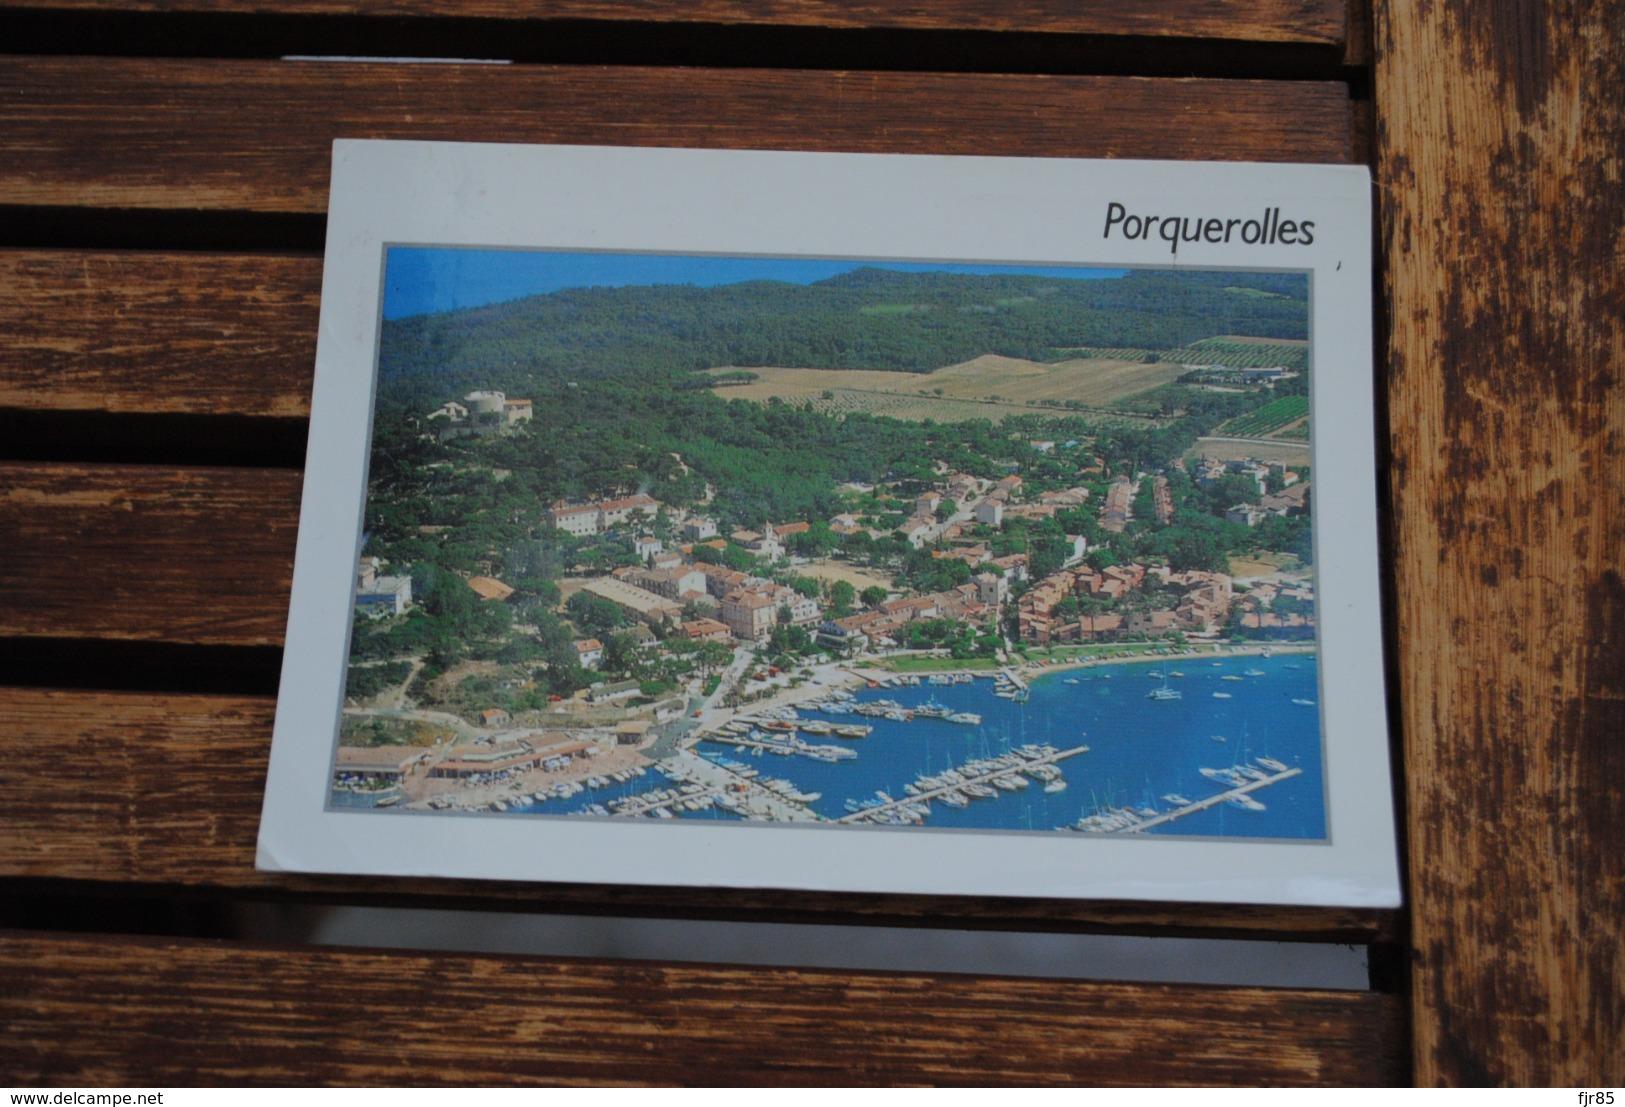 PORQUEROLLES VUE AERIENNE DU VILLAGE PHOTO N FRANGOS - Porquerolles